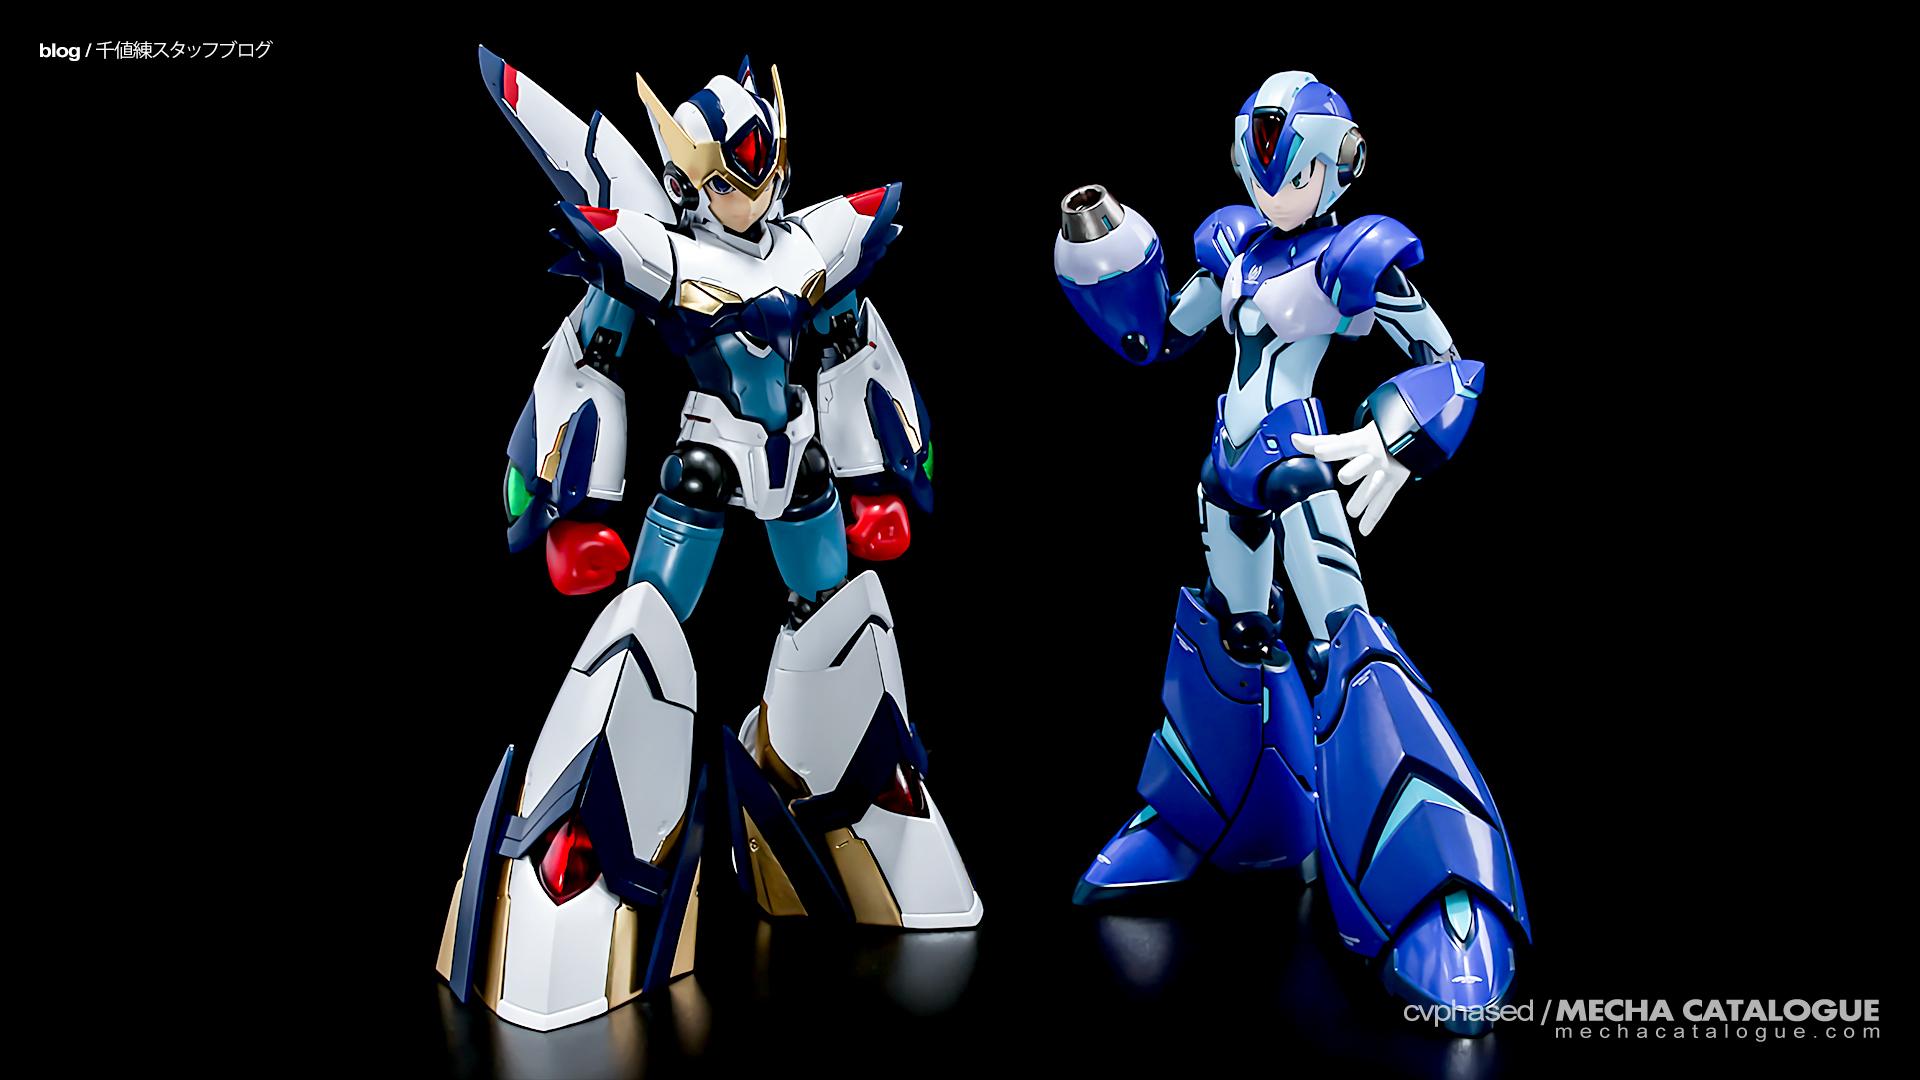 Plastic Crack: RIOBOT Rockman X Falcon Armor (Ver. Eiichi Shimizu) ✕ Designer Series Rockman X